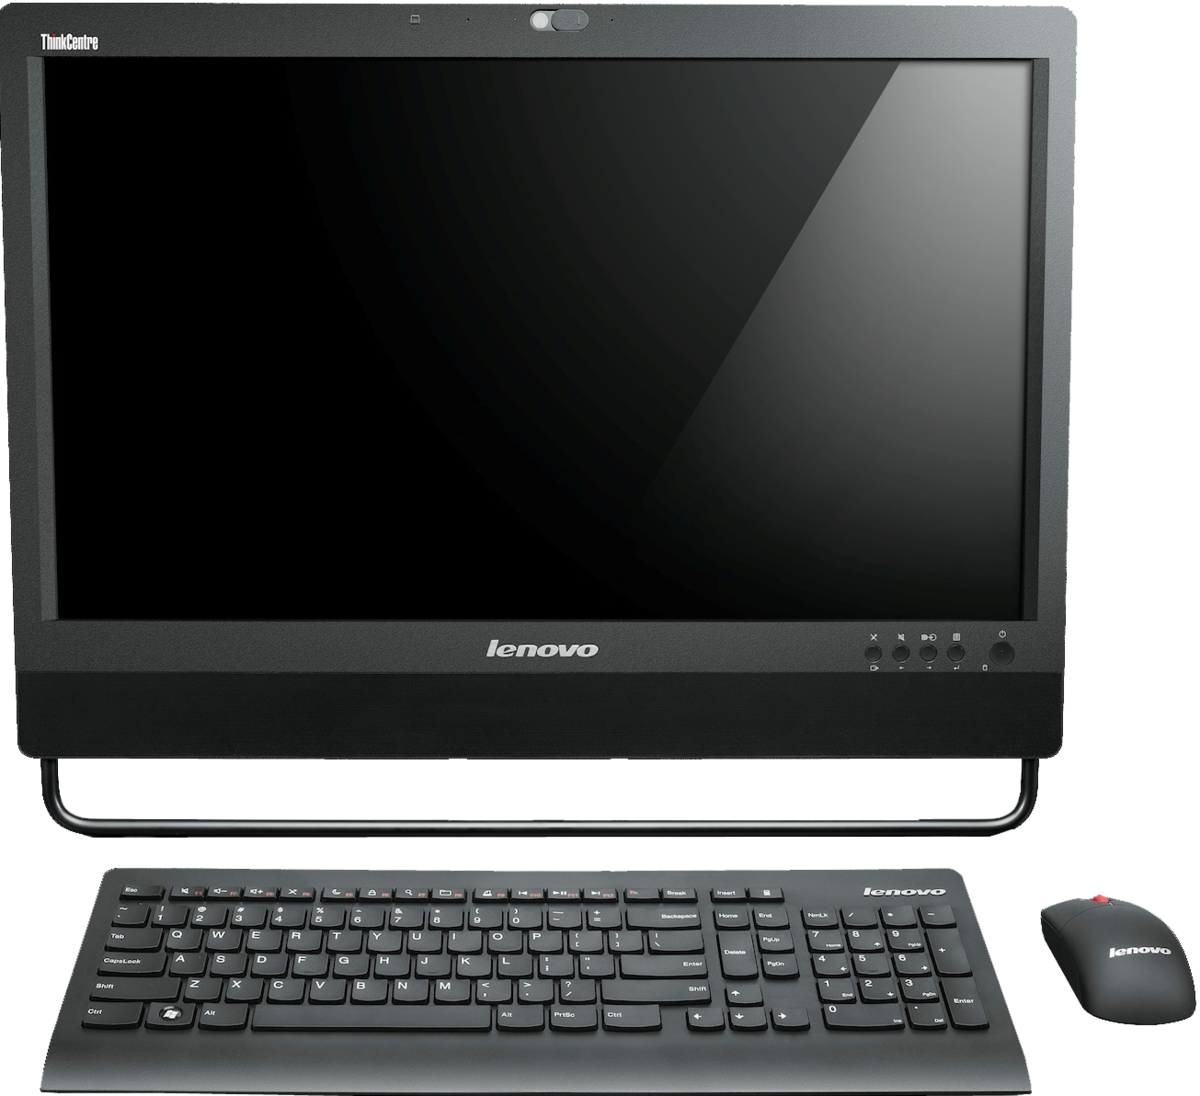 Lenovo ThinkCentre M92z 23